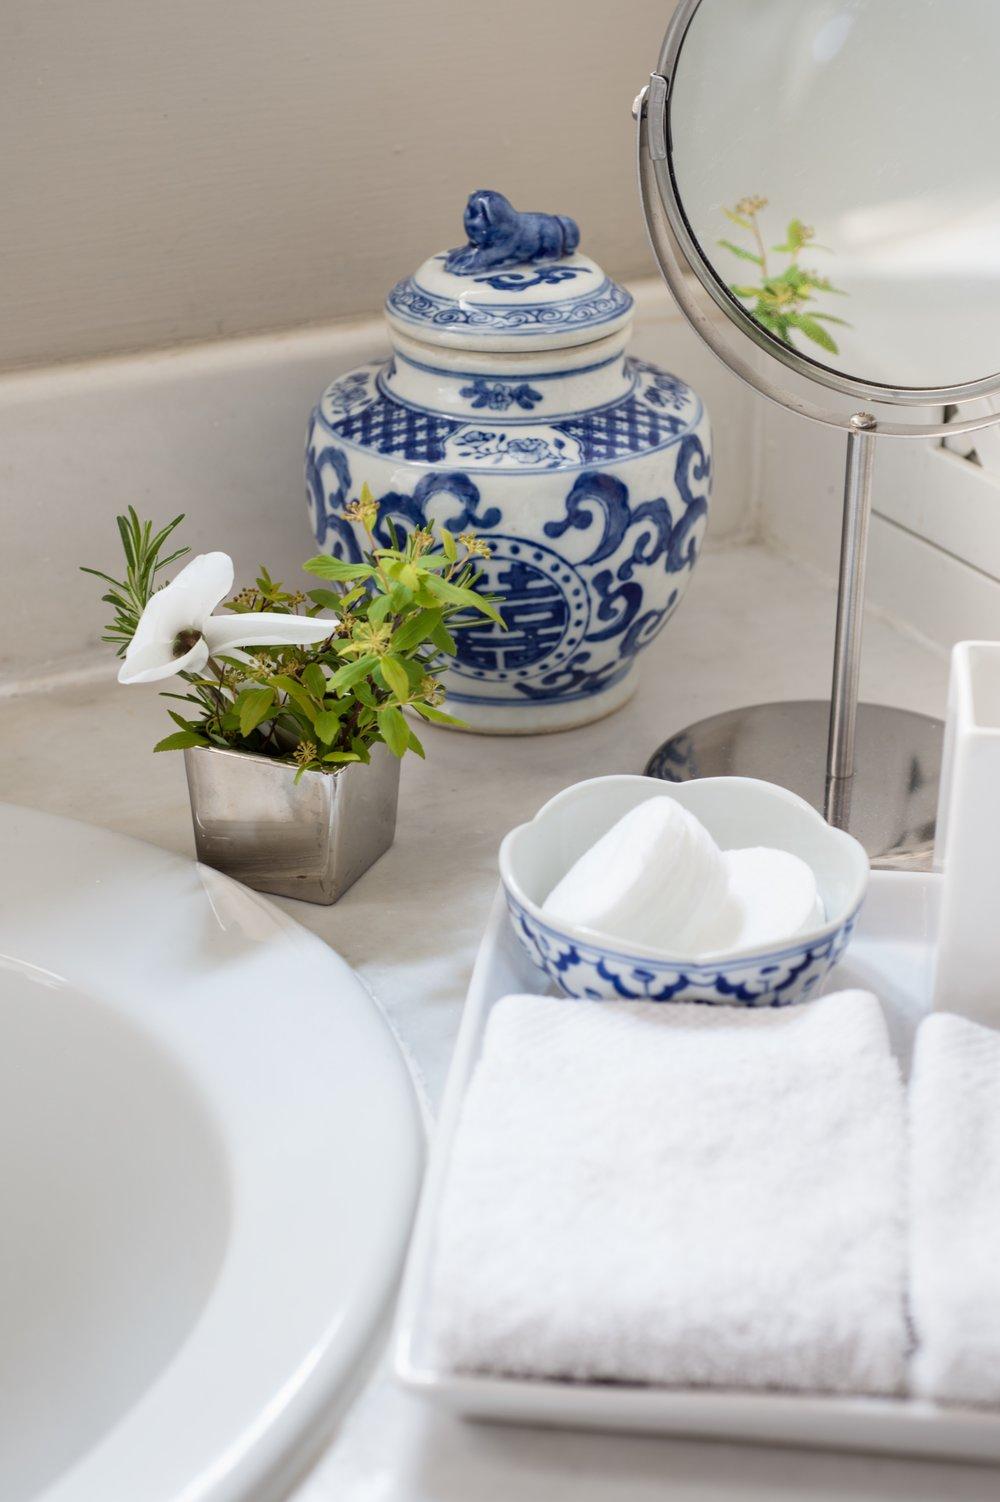 Blue room bathroom detail